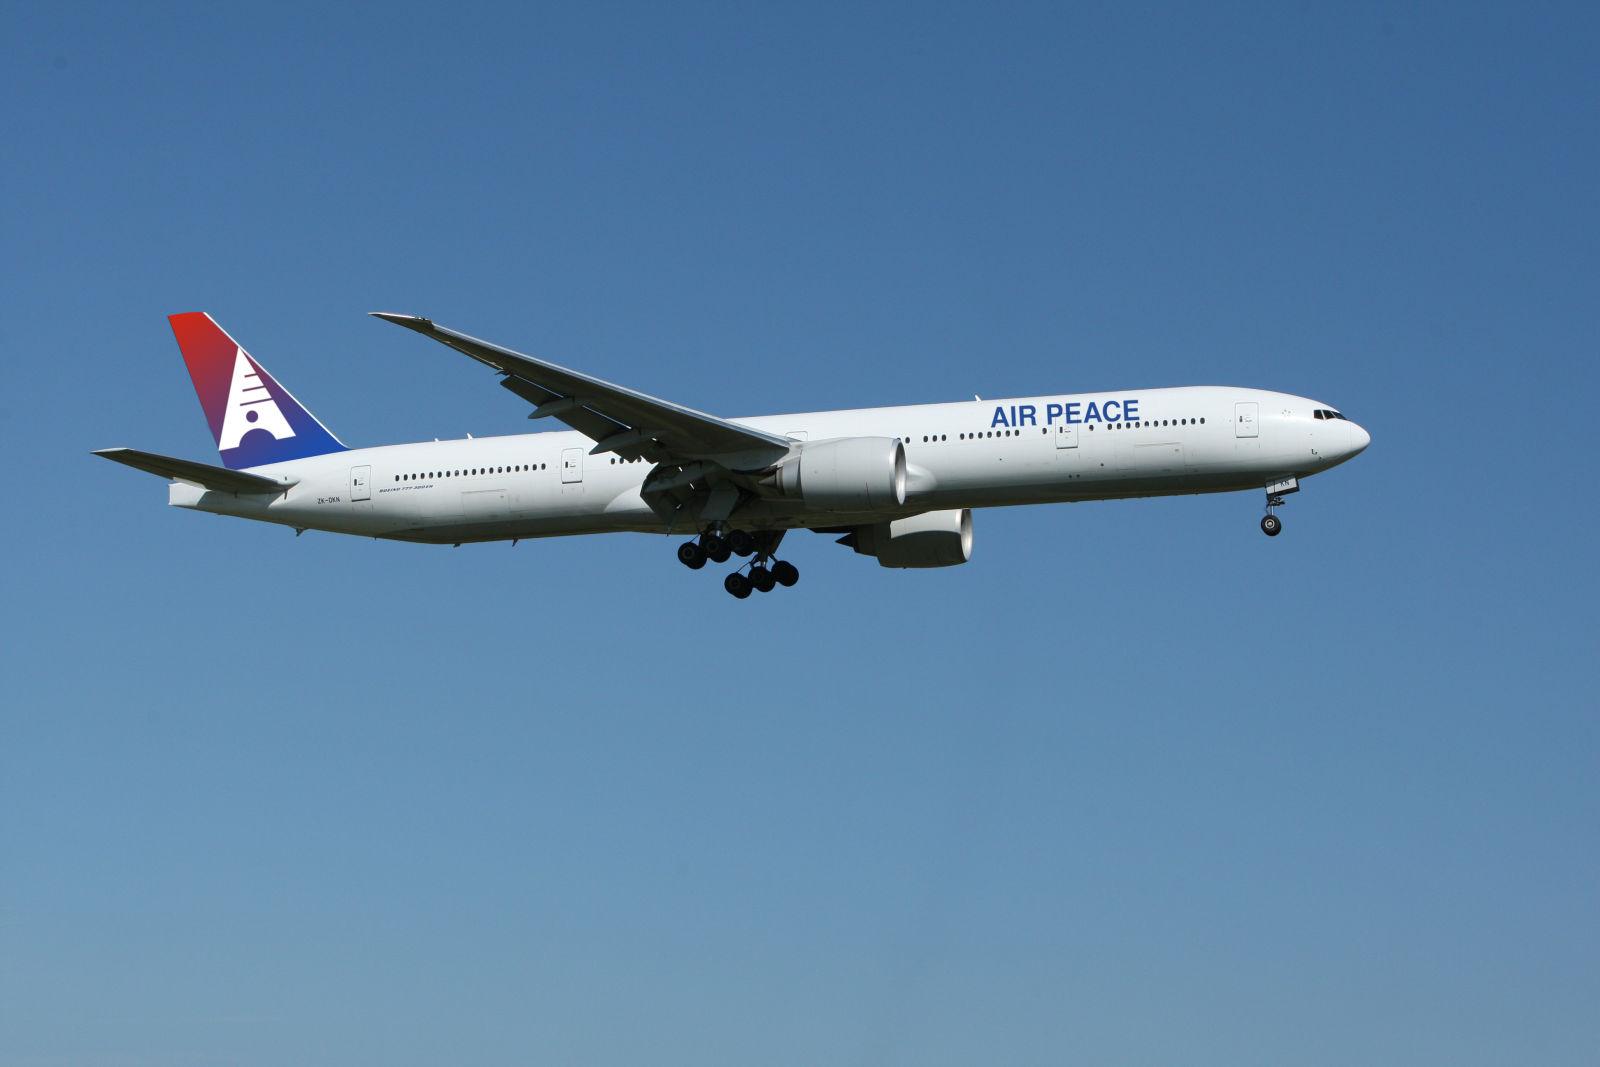 airplane_in_air